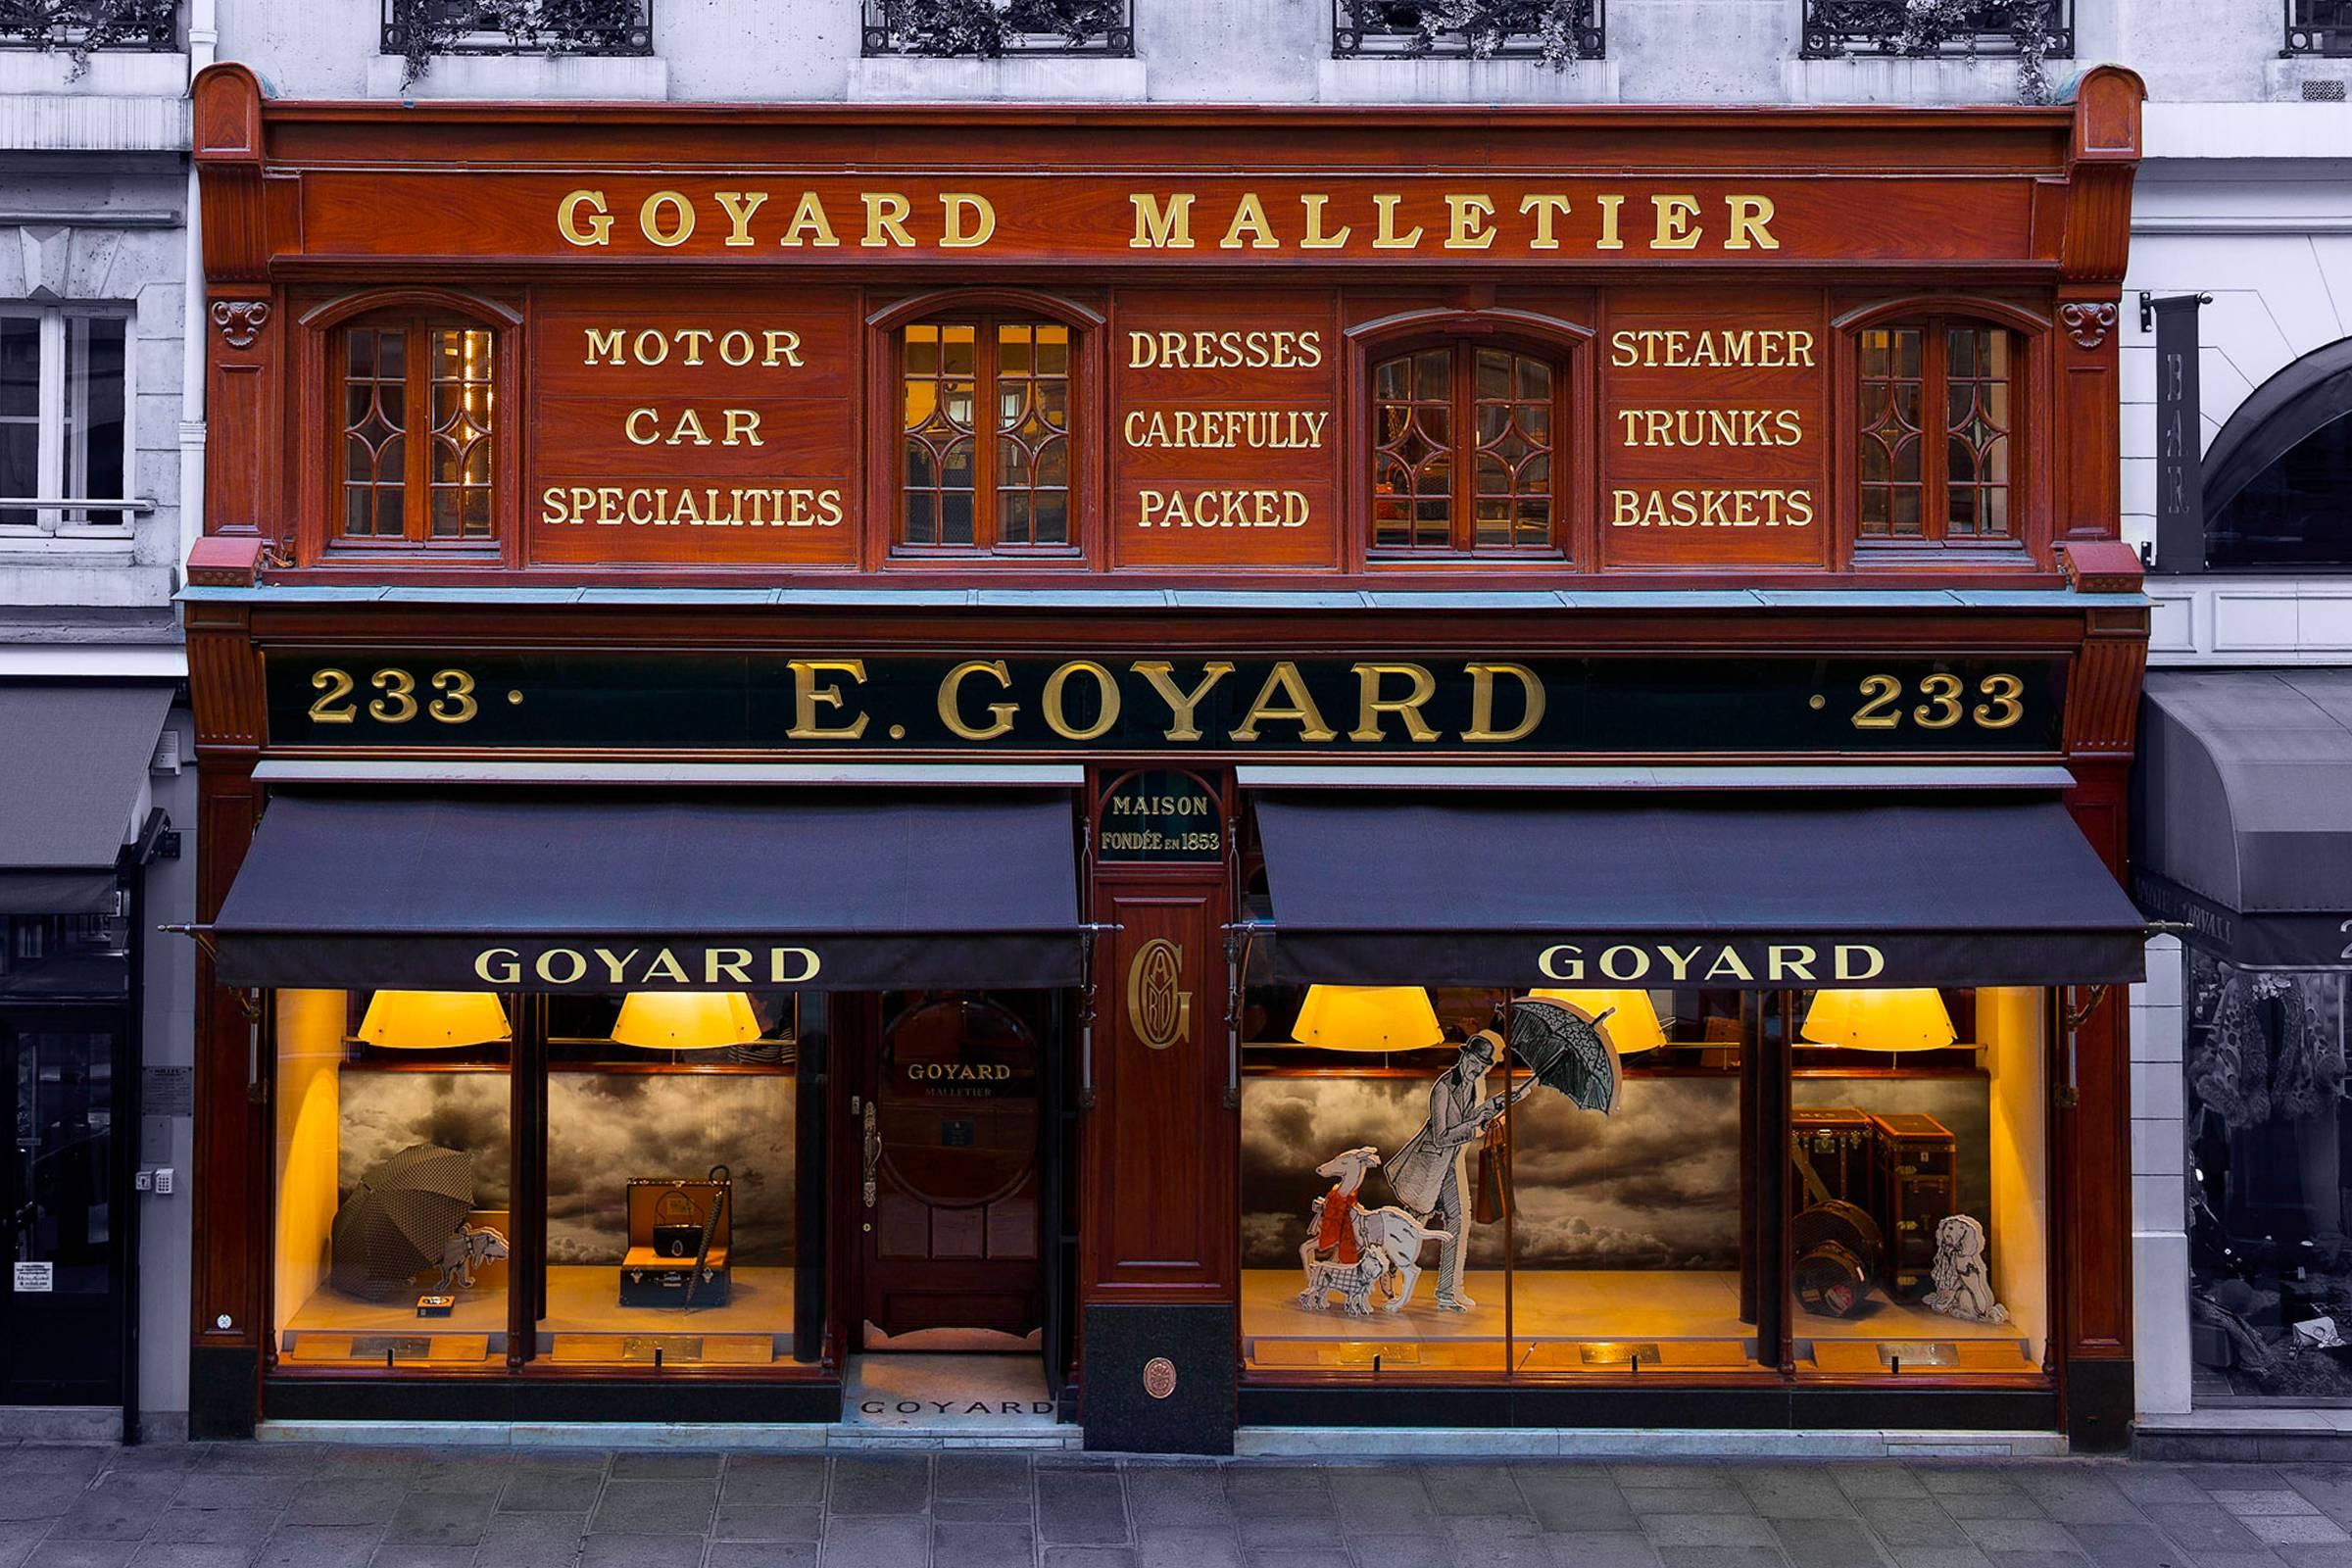 Goyard's flagship at 233 Rue Saint-Honoré